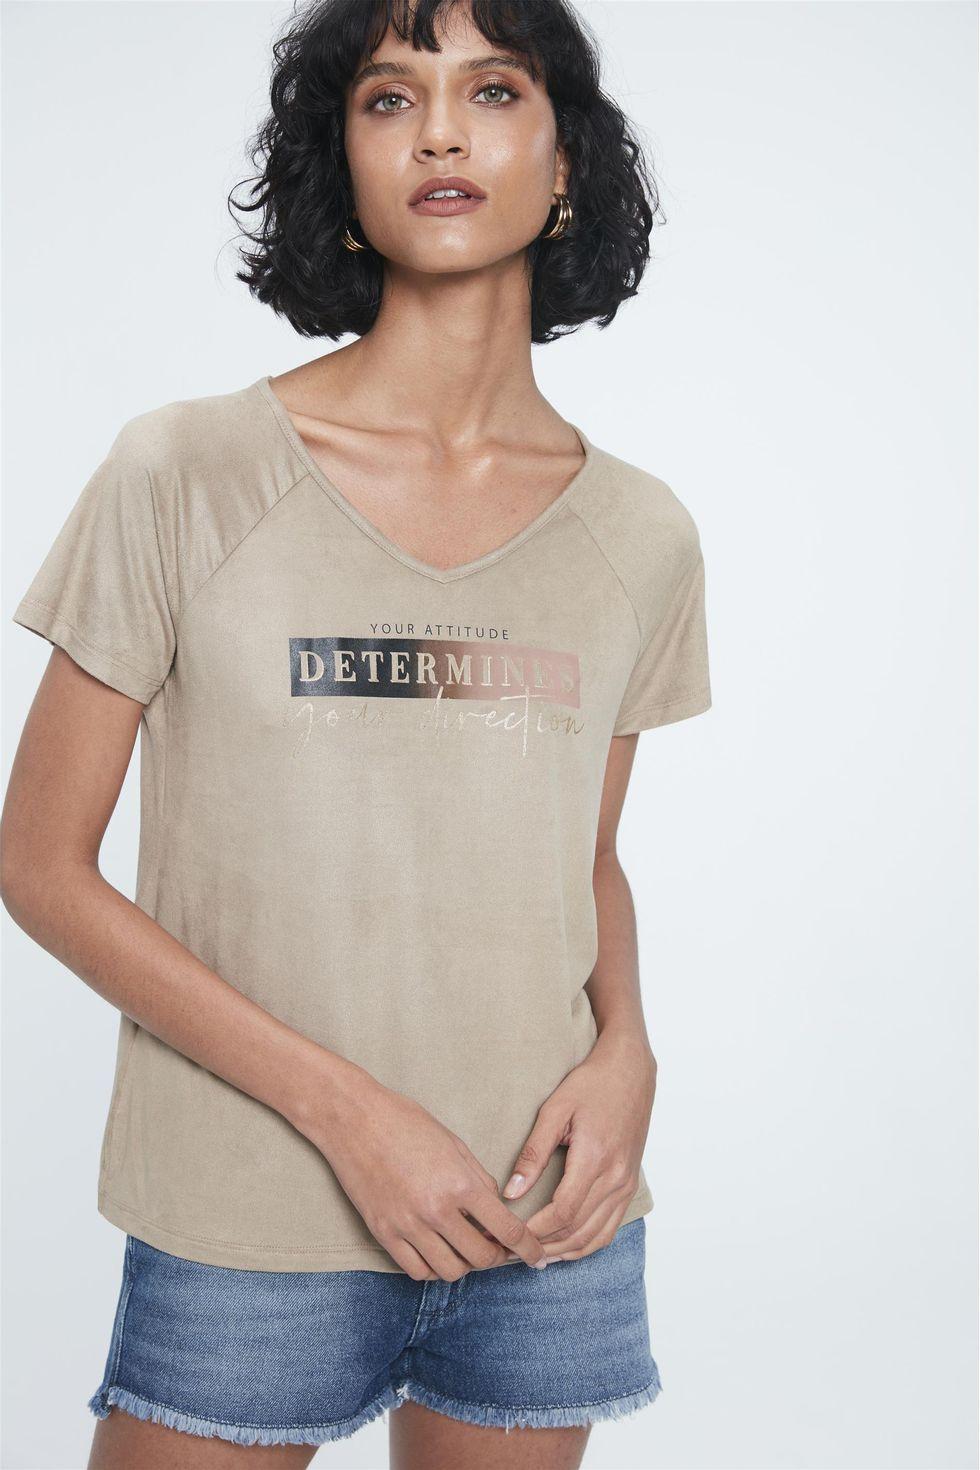 Camiseta-de-Suede-com-Estampa-Determines-Frente--